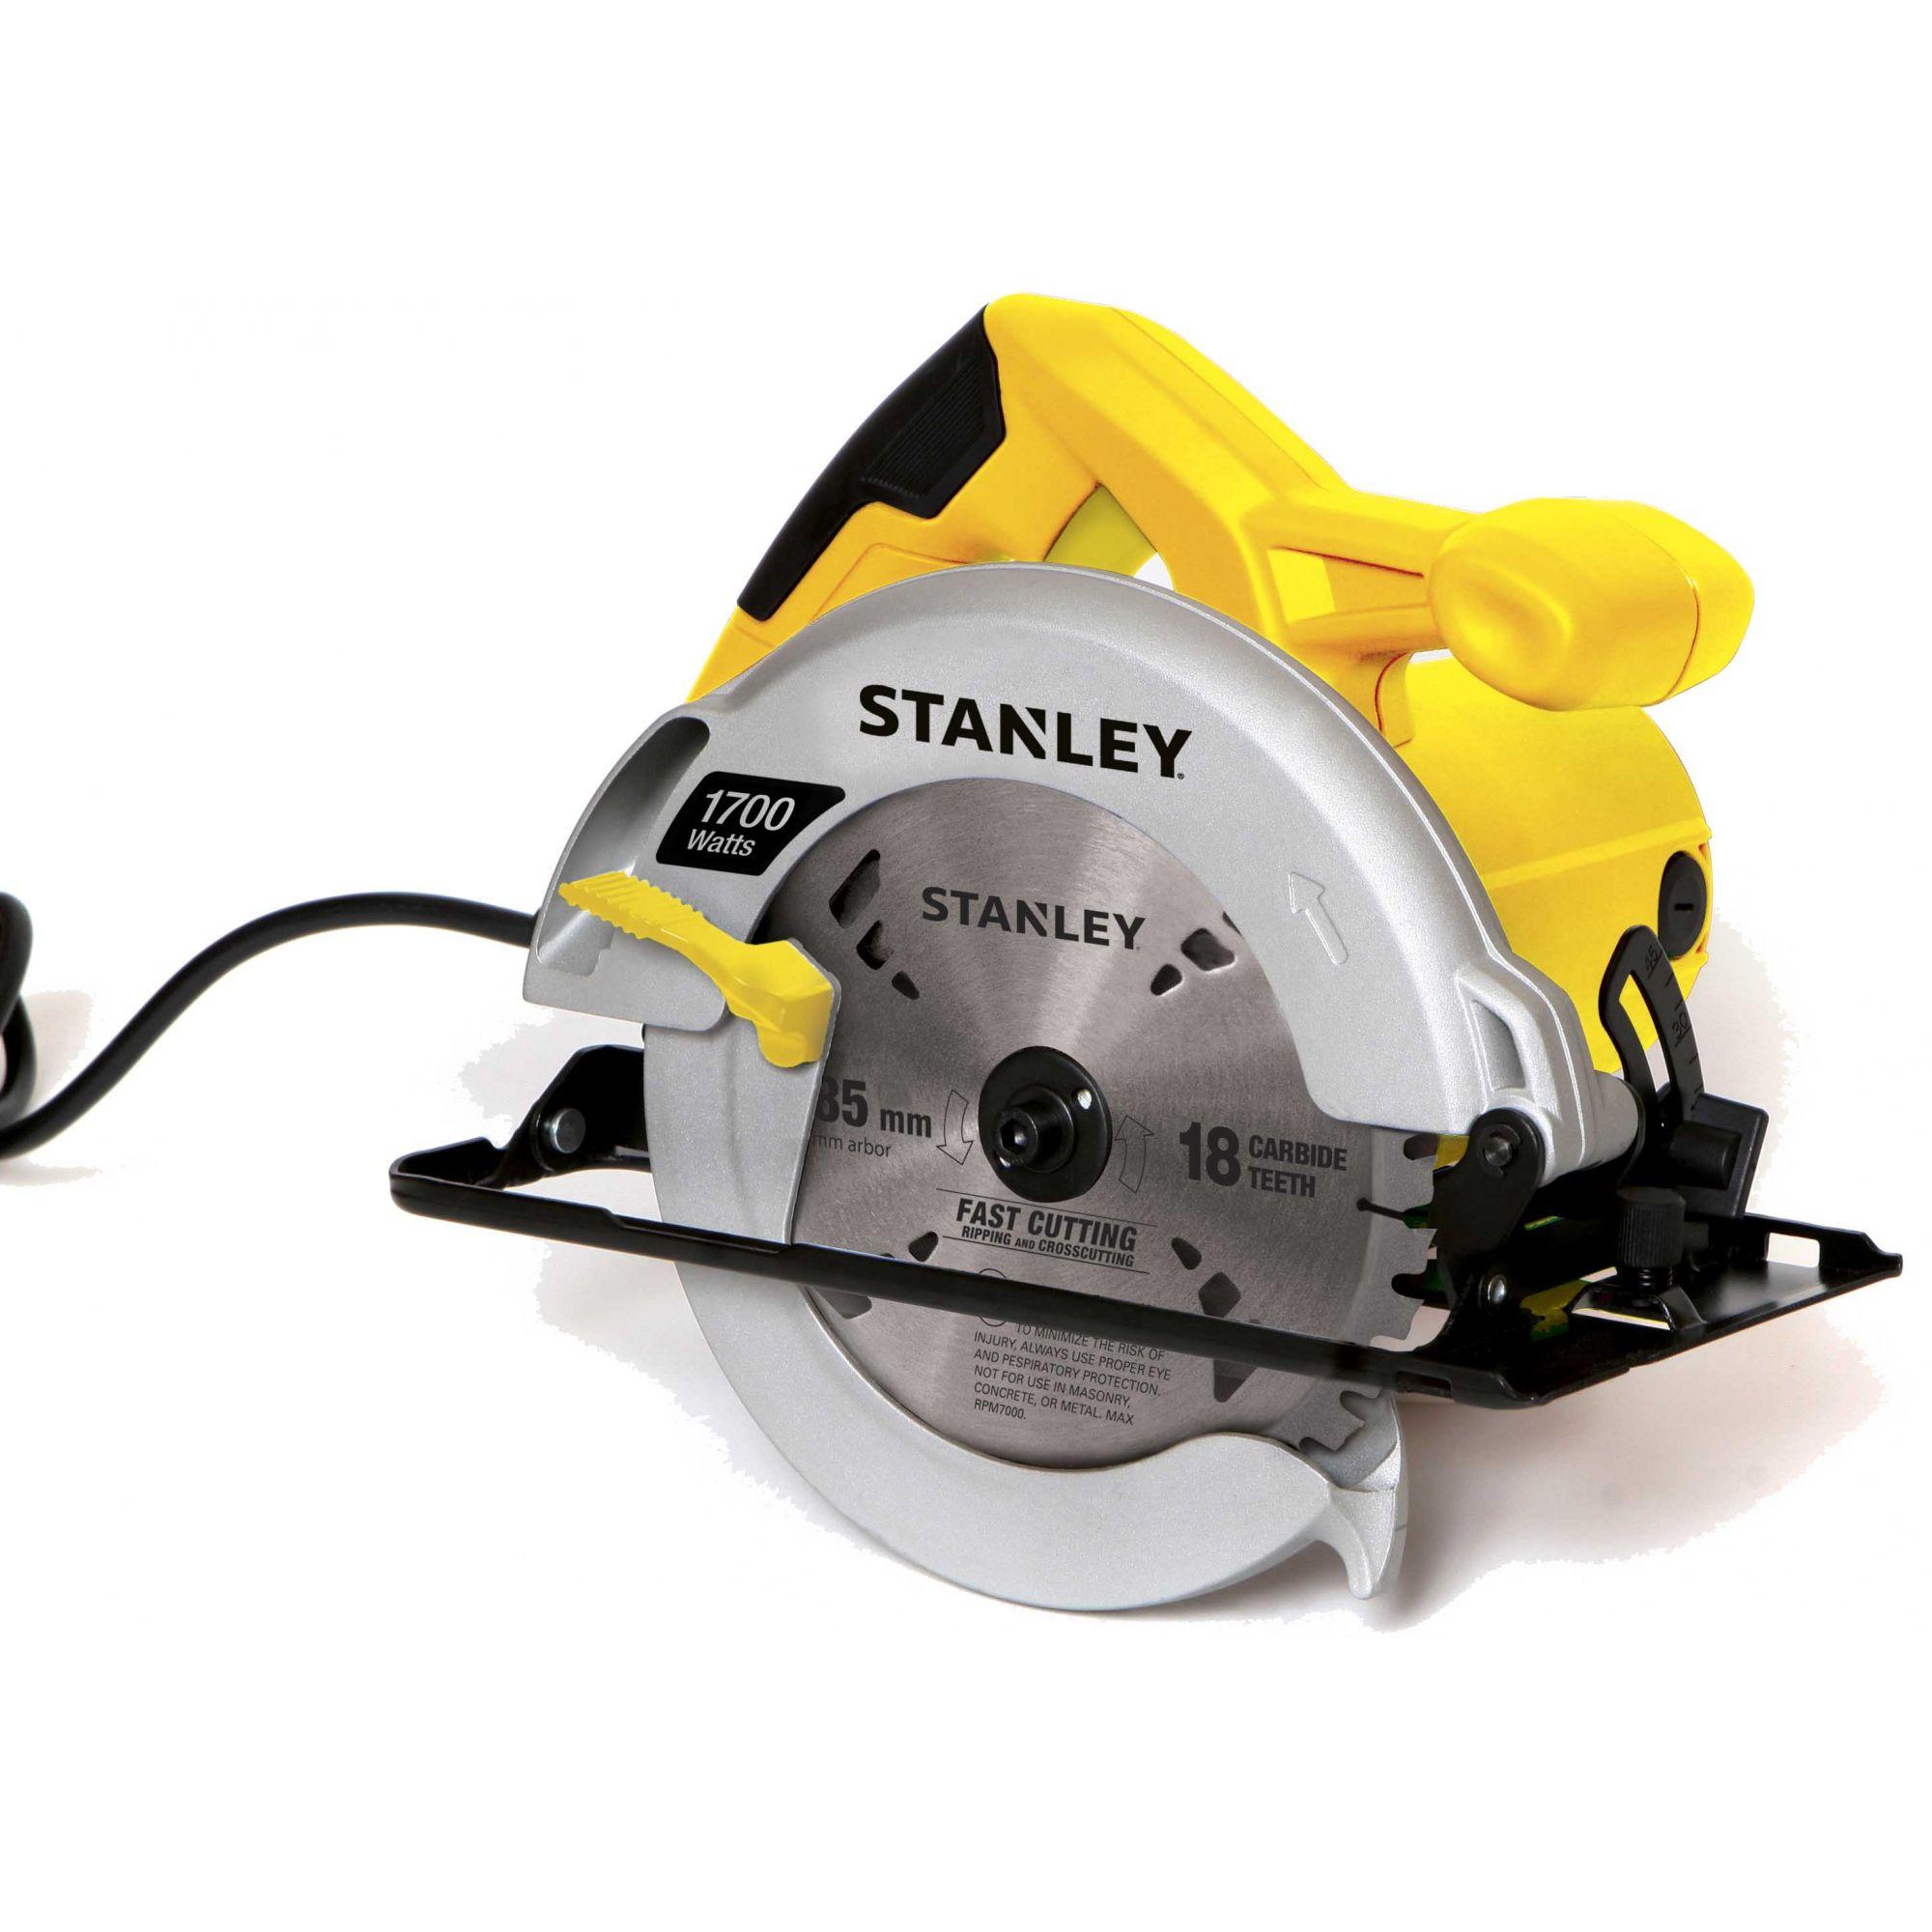 Serra Circular 7.1/4 Stanley STSC1718 110V 1700 watts